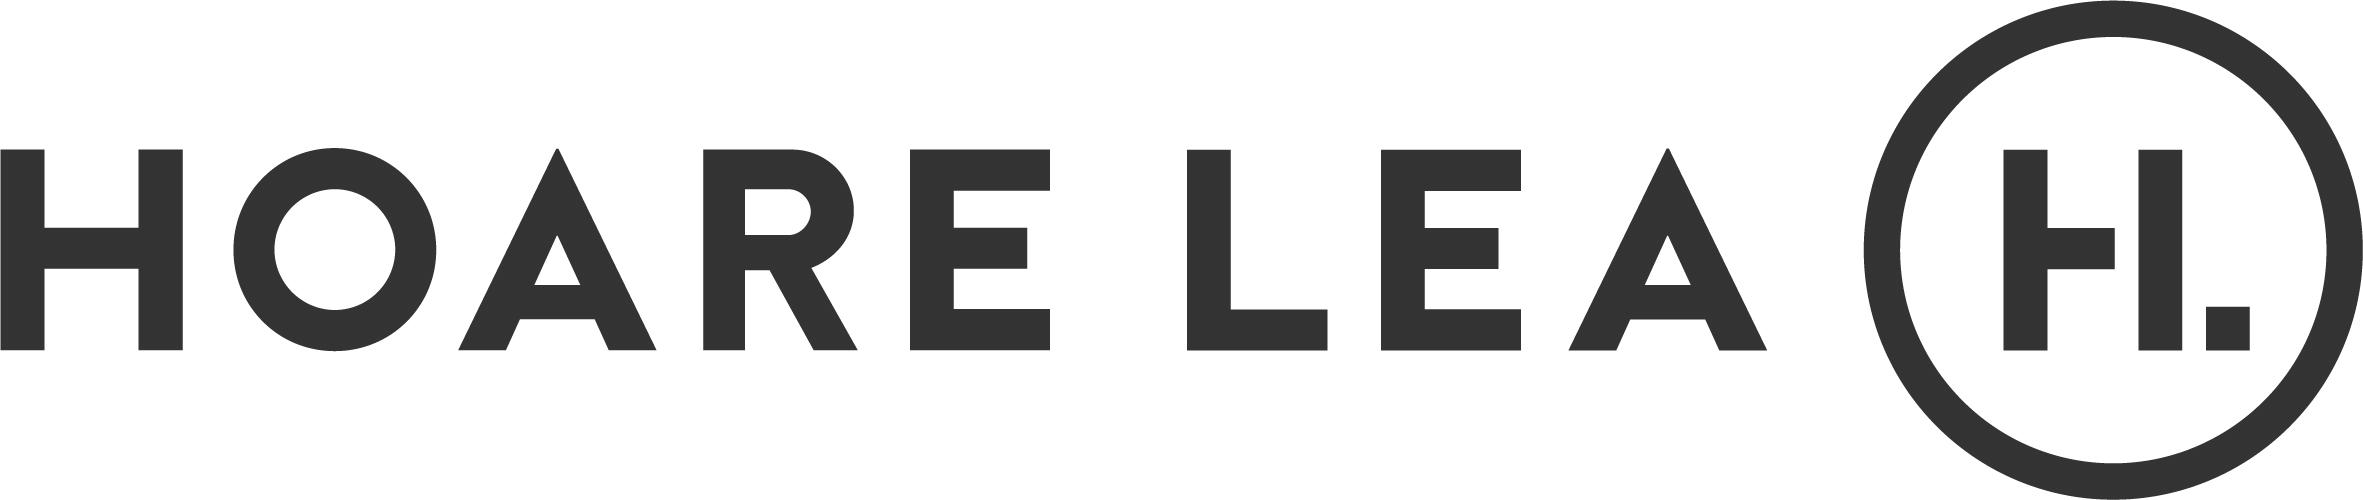 HL logo rgb MASTER.jpg